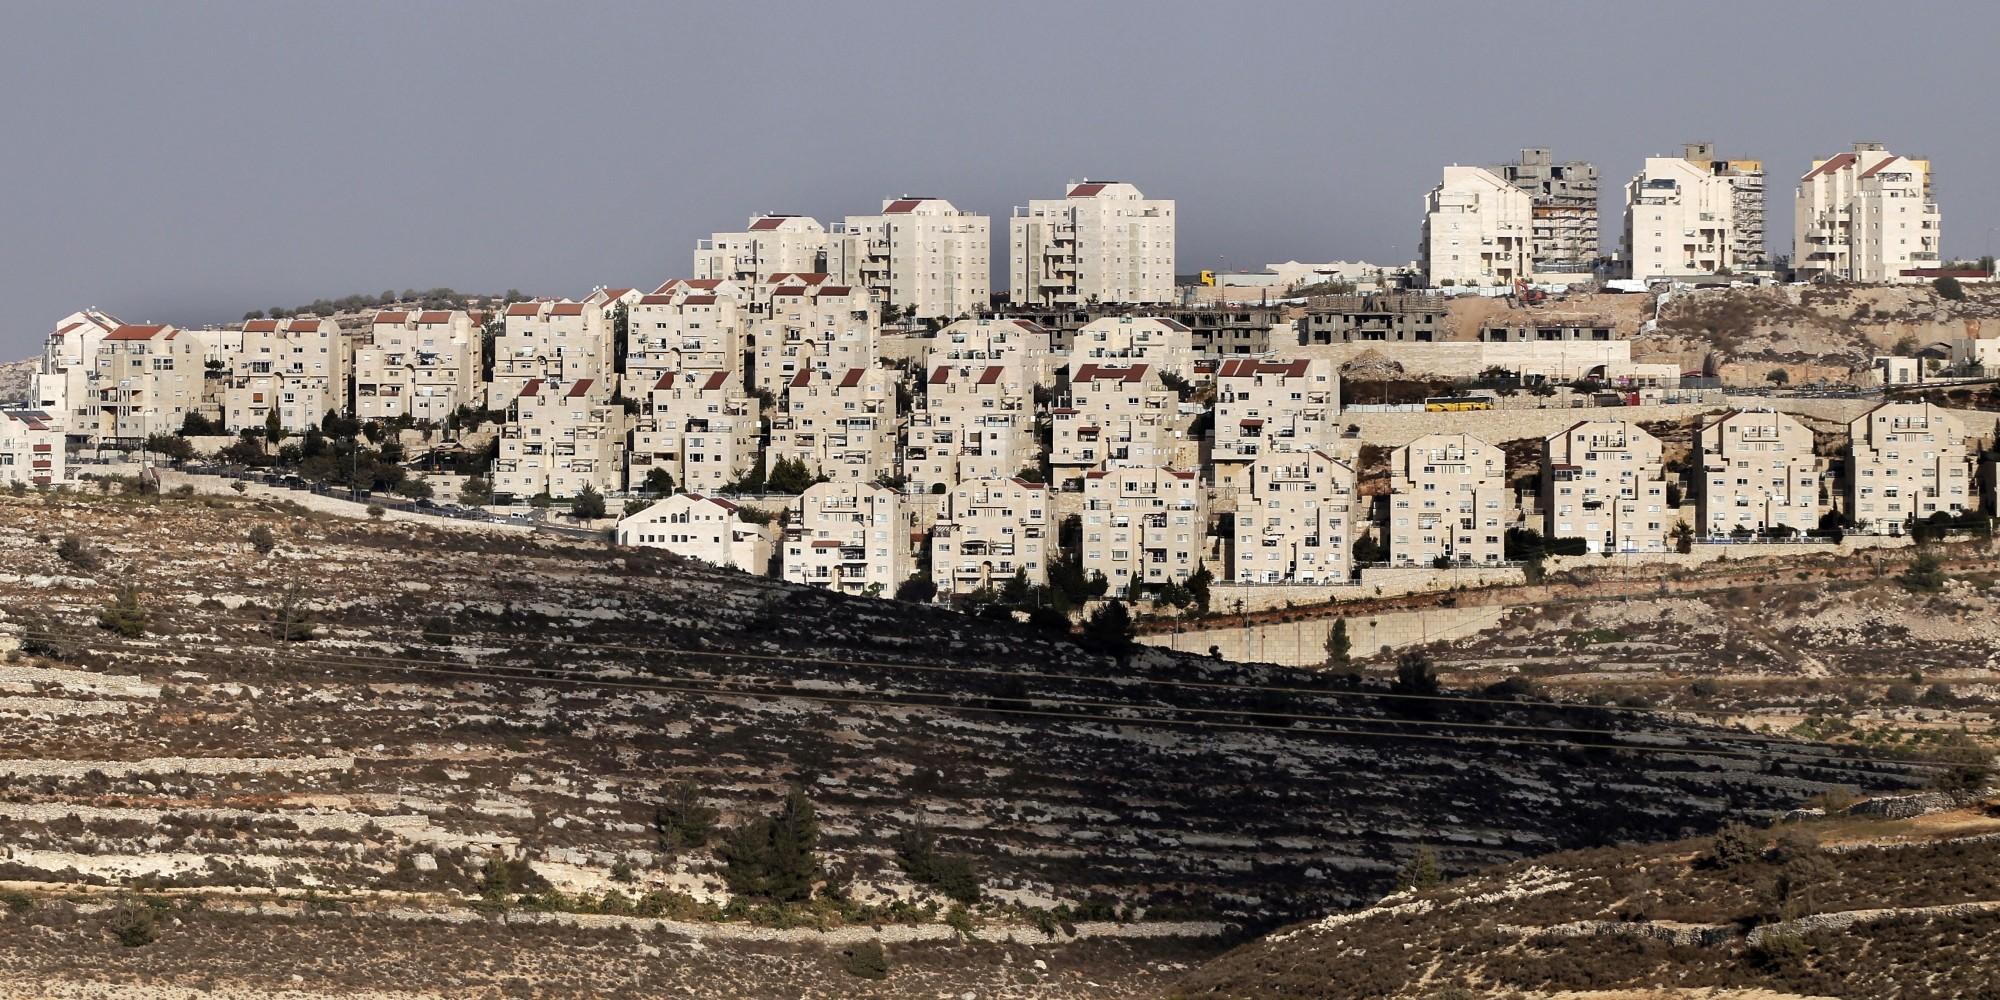 Christian evangelicals harvest land in settlements Israel hopes to annex